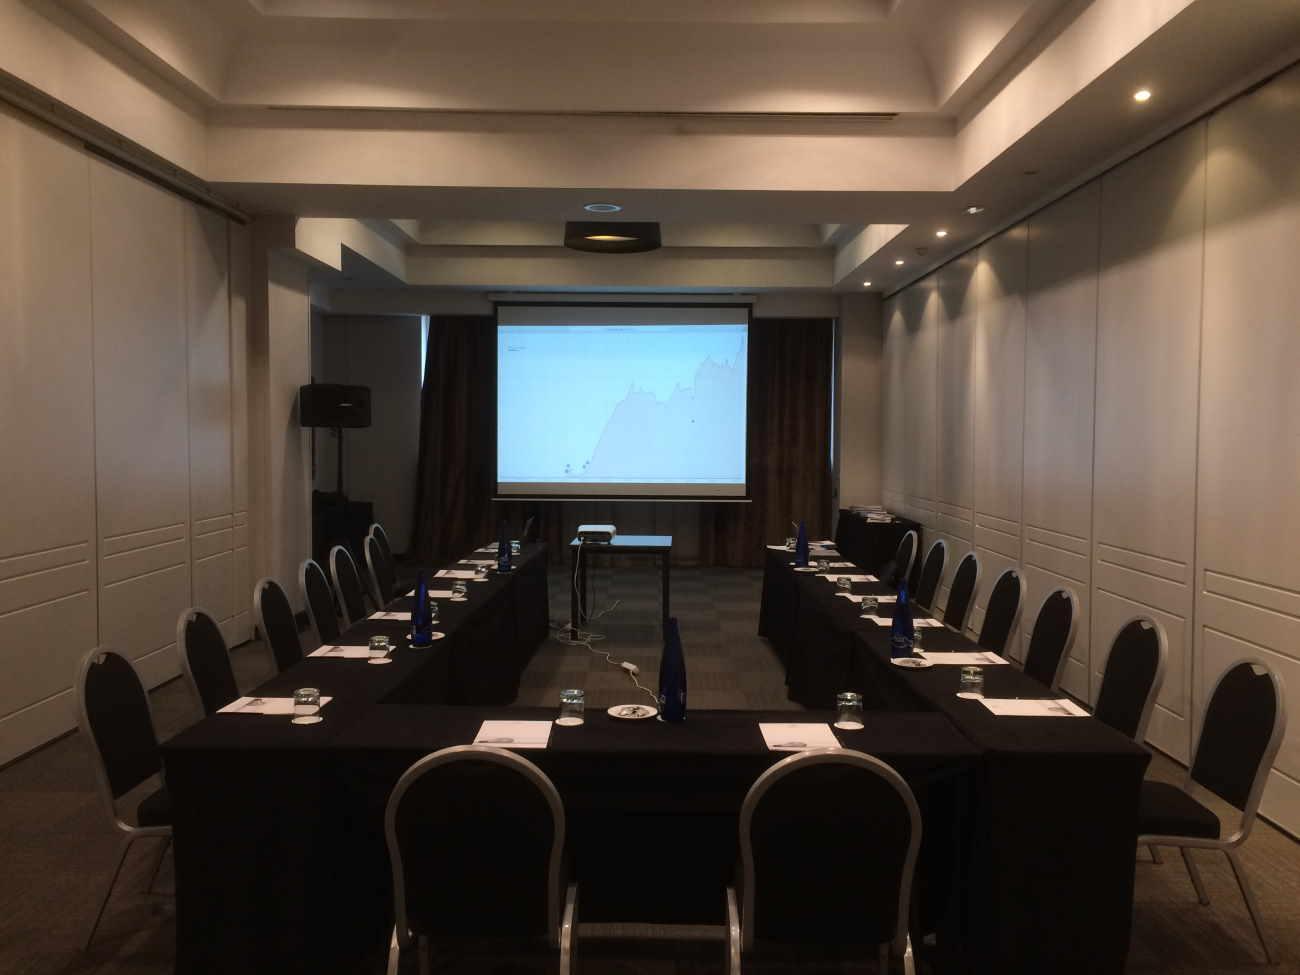 Sala de los talleres de SISTRIX en el Rafael Hotels Atocha - Madrid